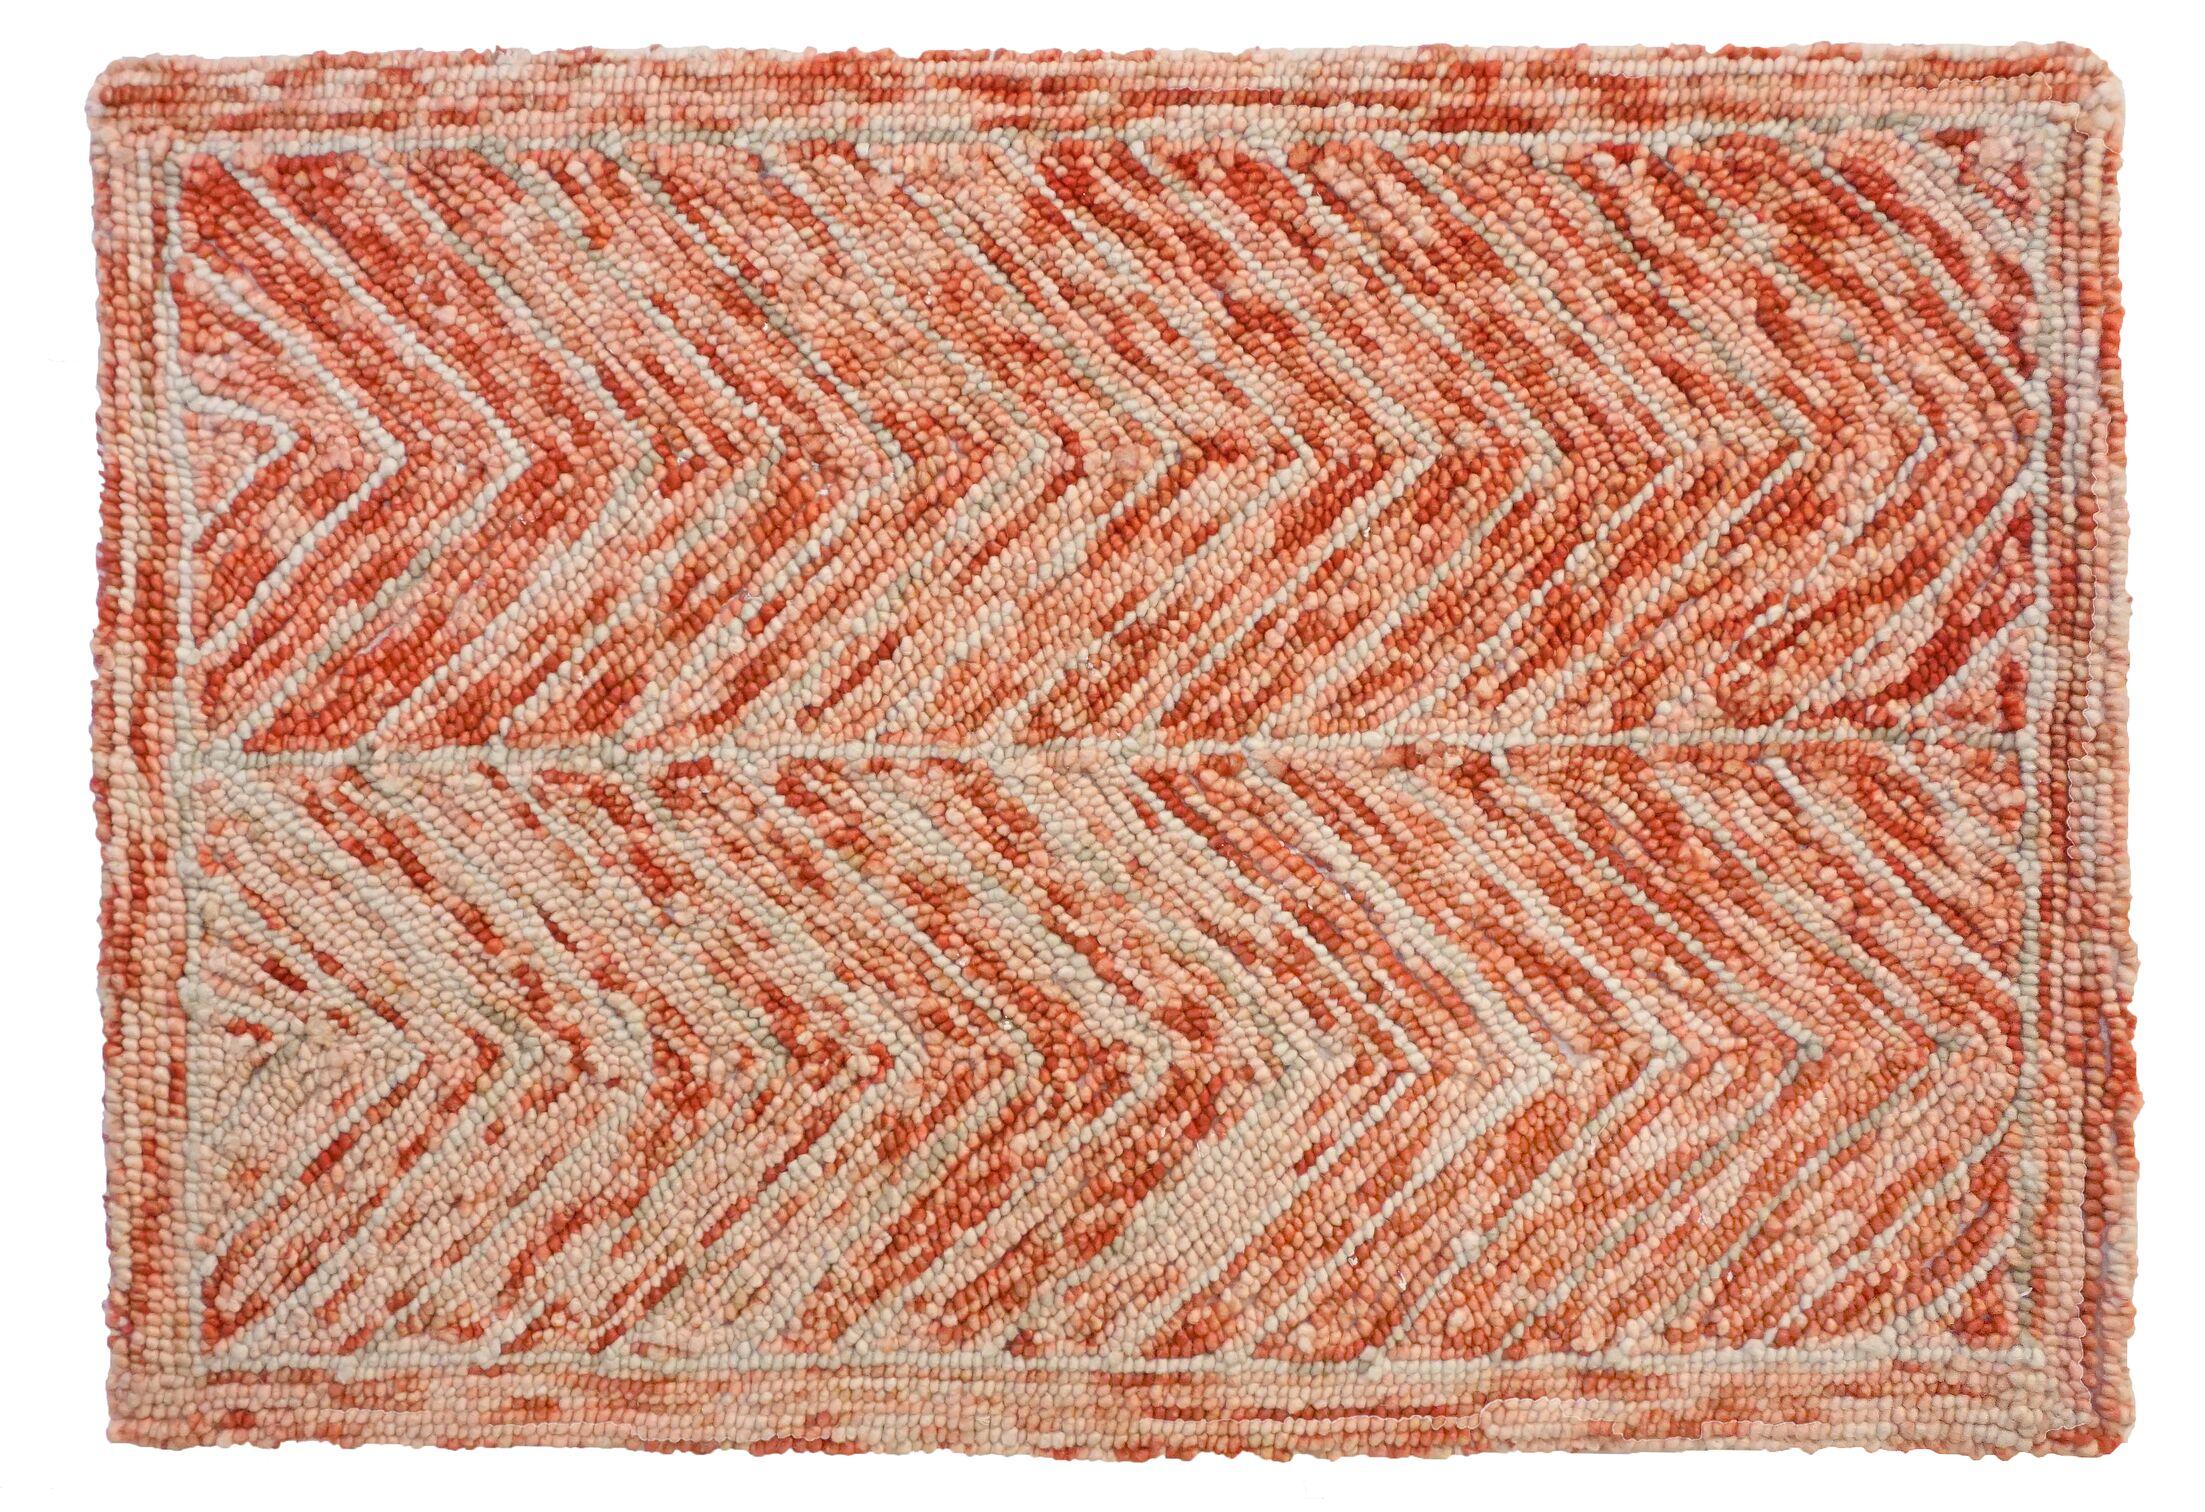 Sharadan Hand Tufted Wool Red Area Rug Rug Size: 3' x 5'